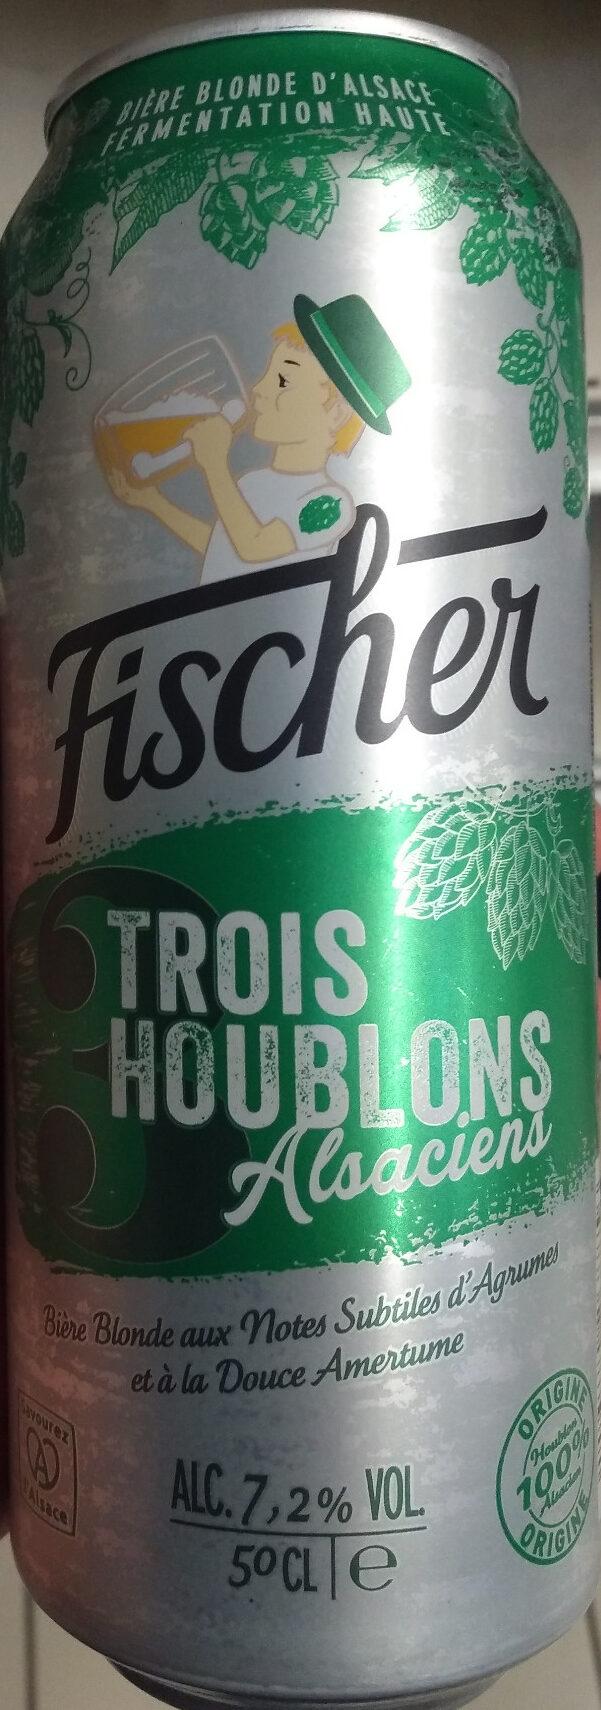 Fischer Trois Houblons Alsaciens - Produit - fr